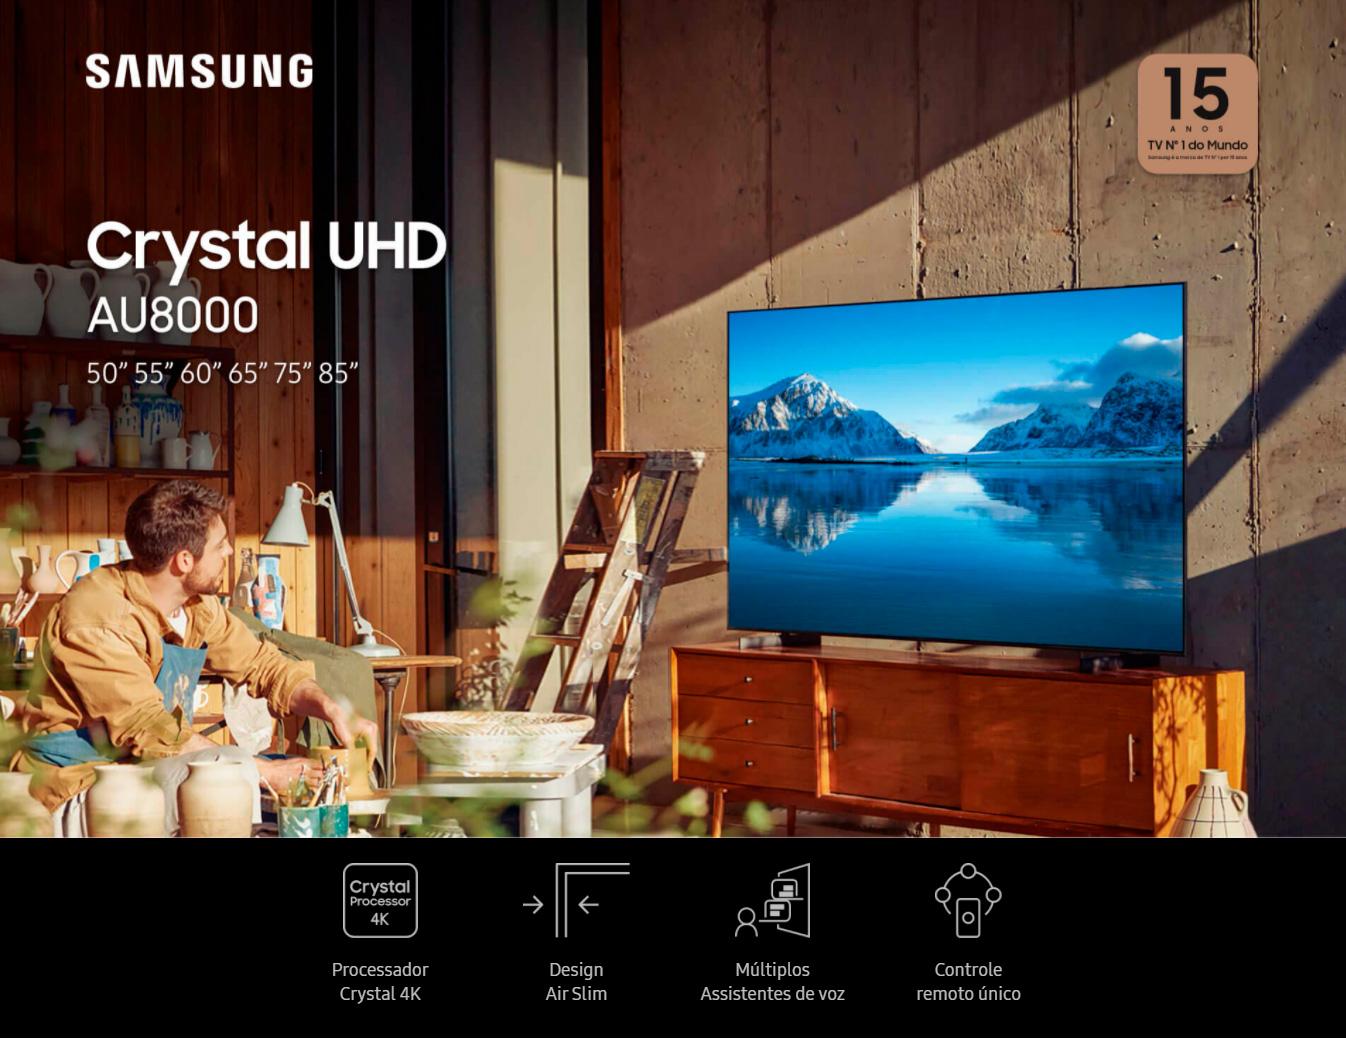 Smart TV 65 Crystal UHD 4K Samsung 65AU8000, Painel Dynamic Crystal Color, Design slim, Tela sem limites, Visual Livre de Cabos, Alexa built in